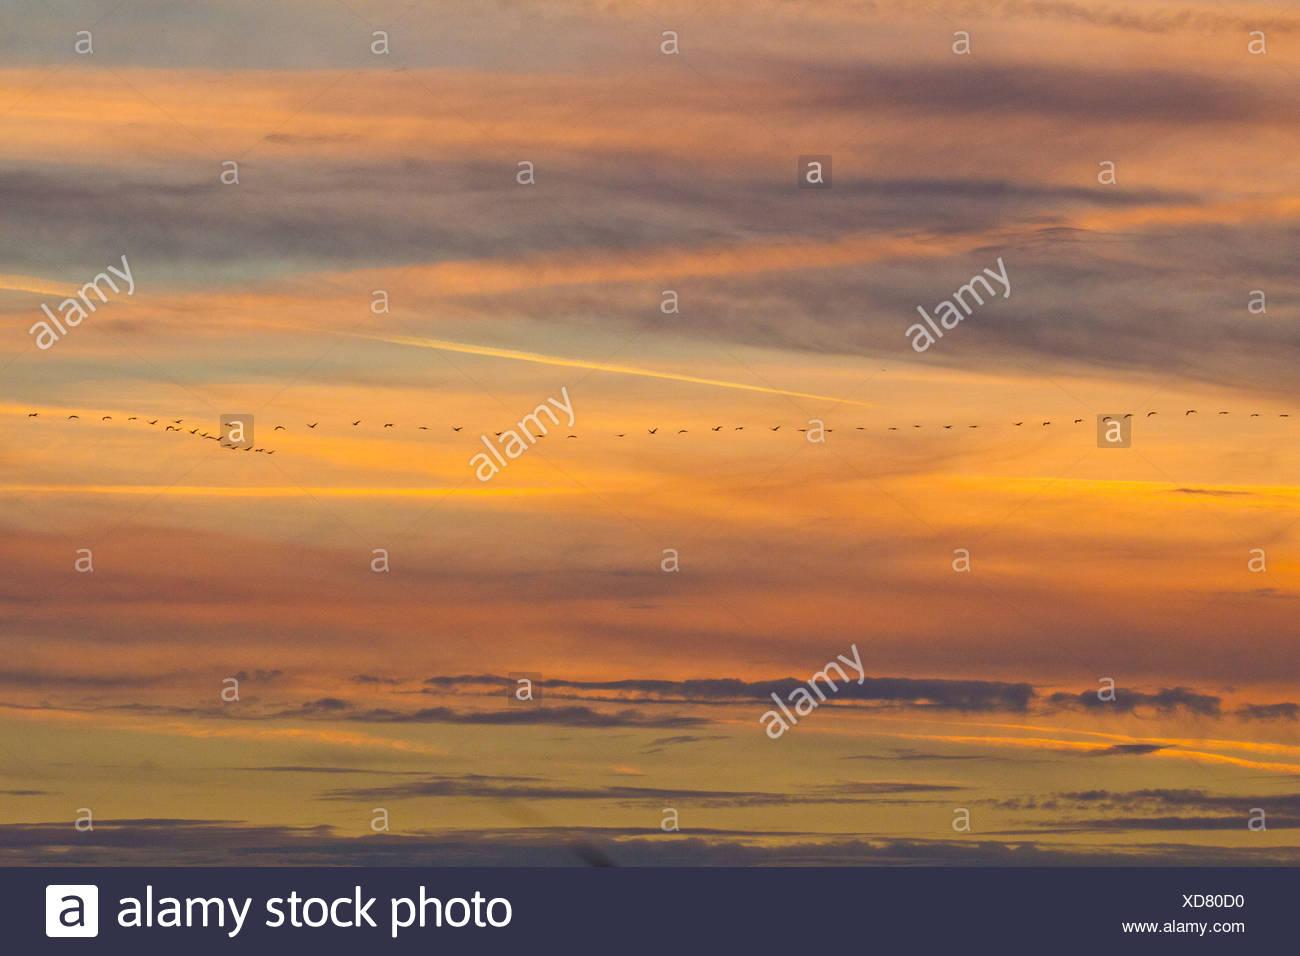 Bird migration of crane at sunset - Stock Image